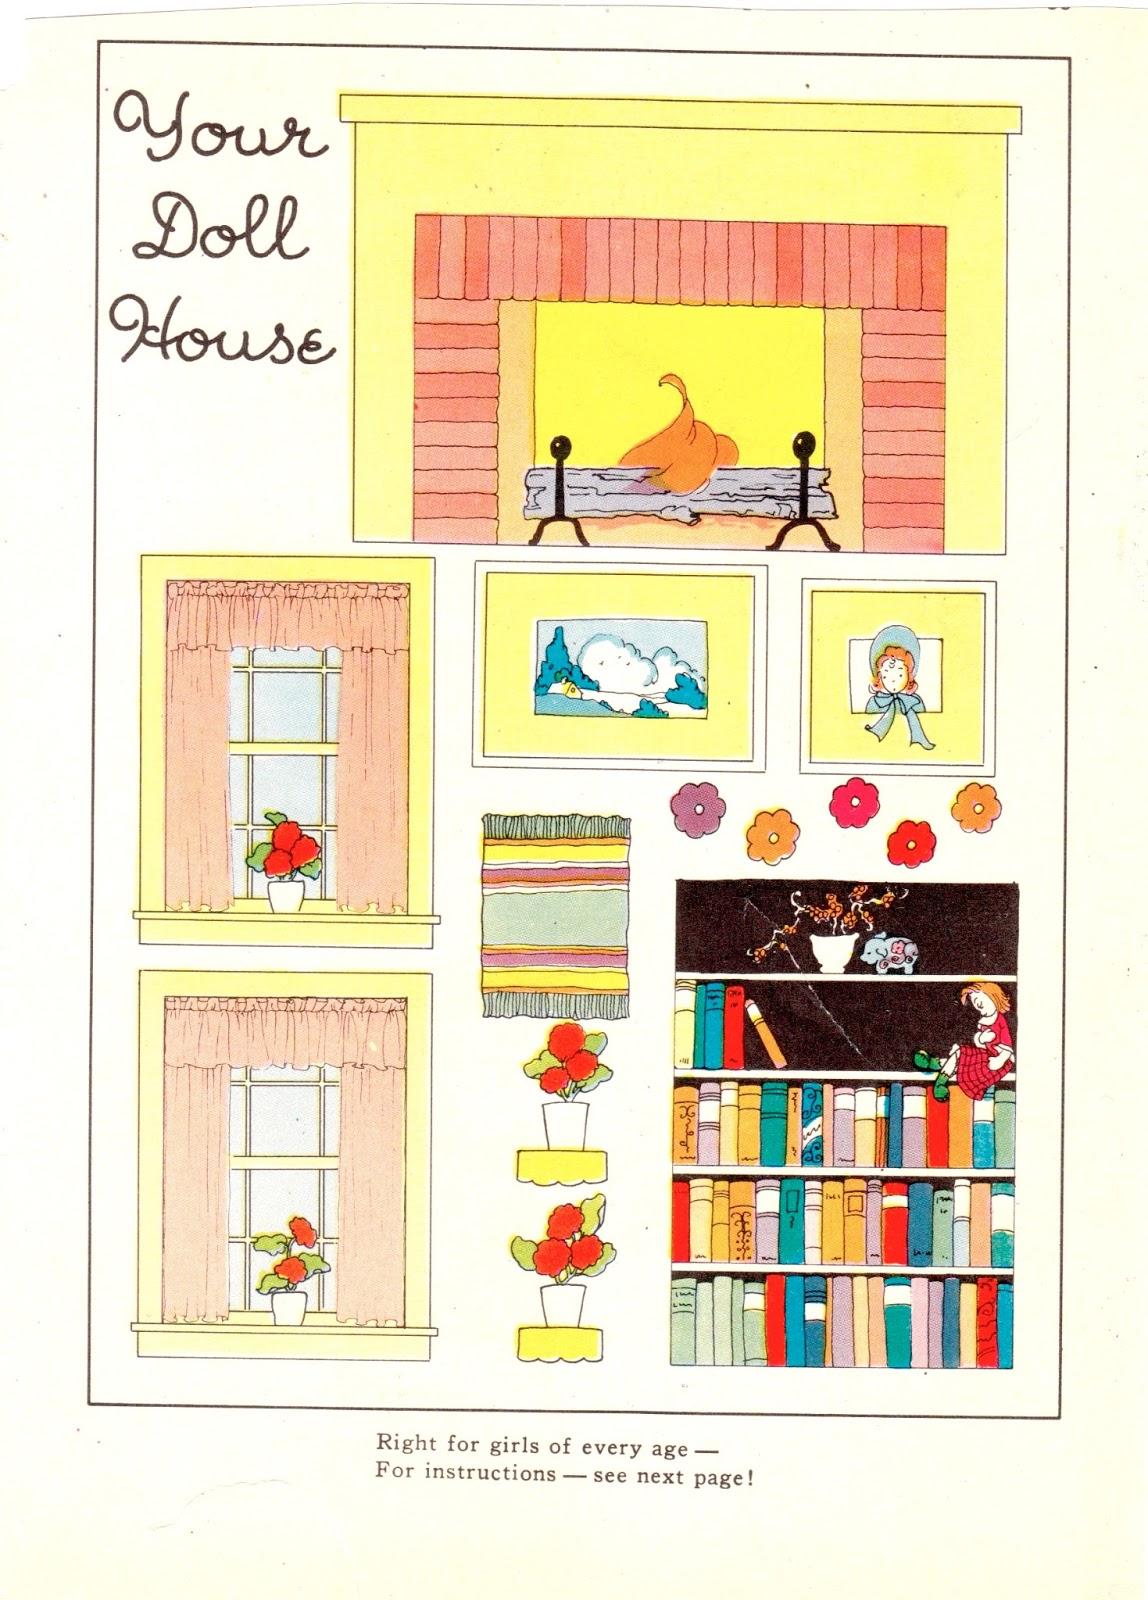 doll house essay